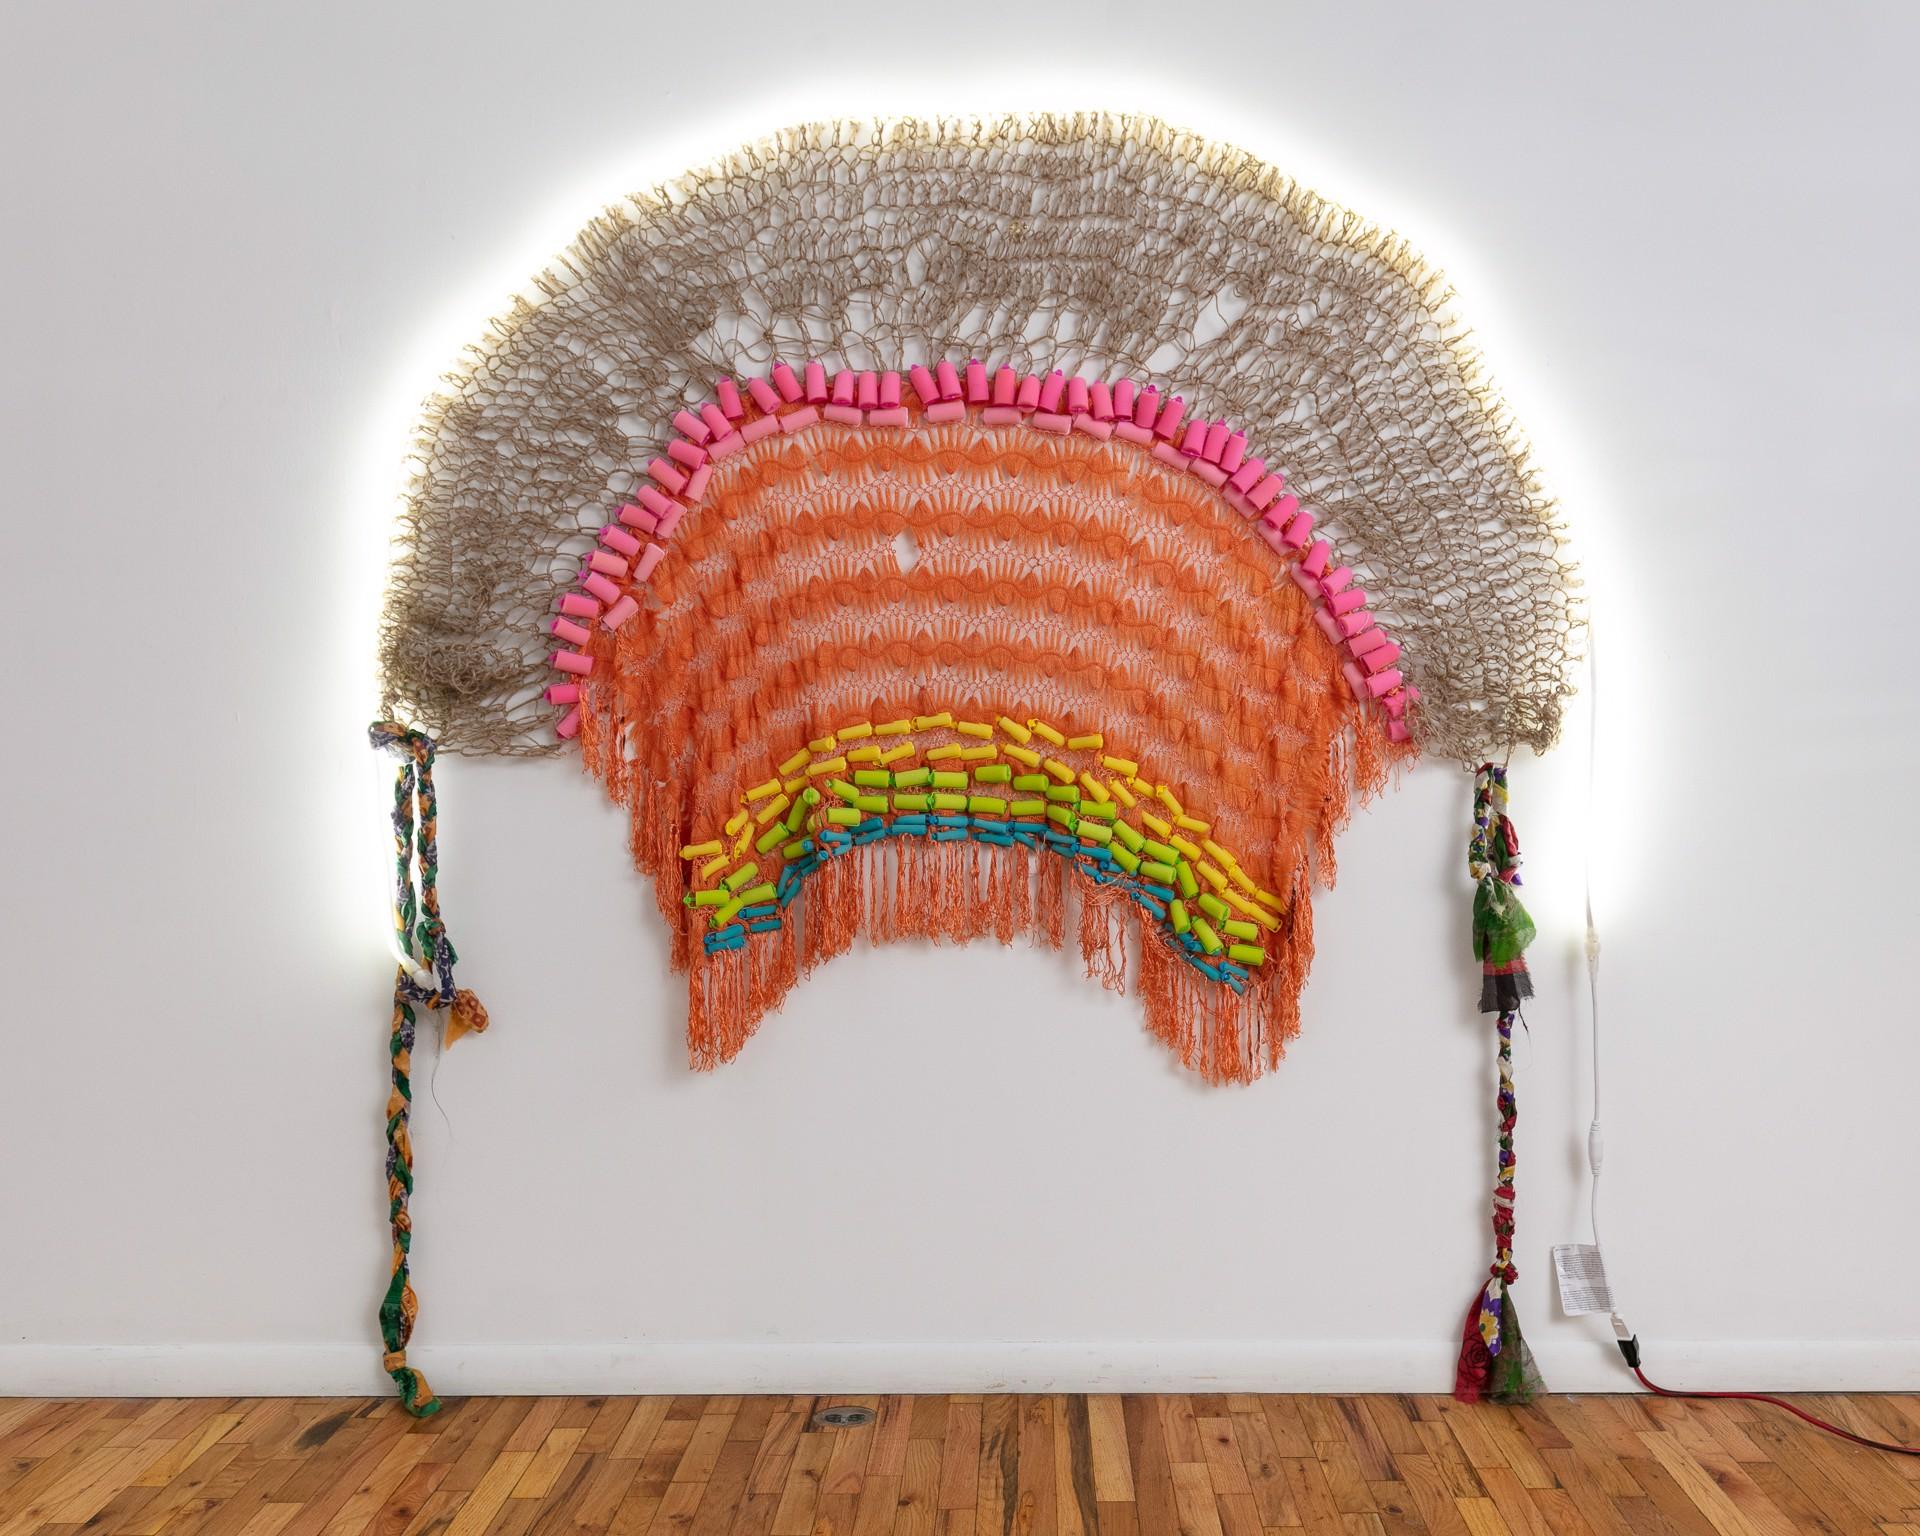 We are Rainbows, We are Shadows by Suchitra Mattai